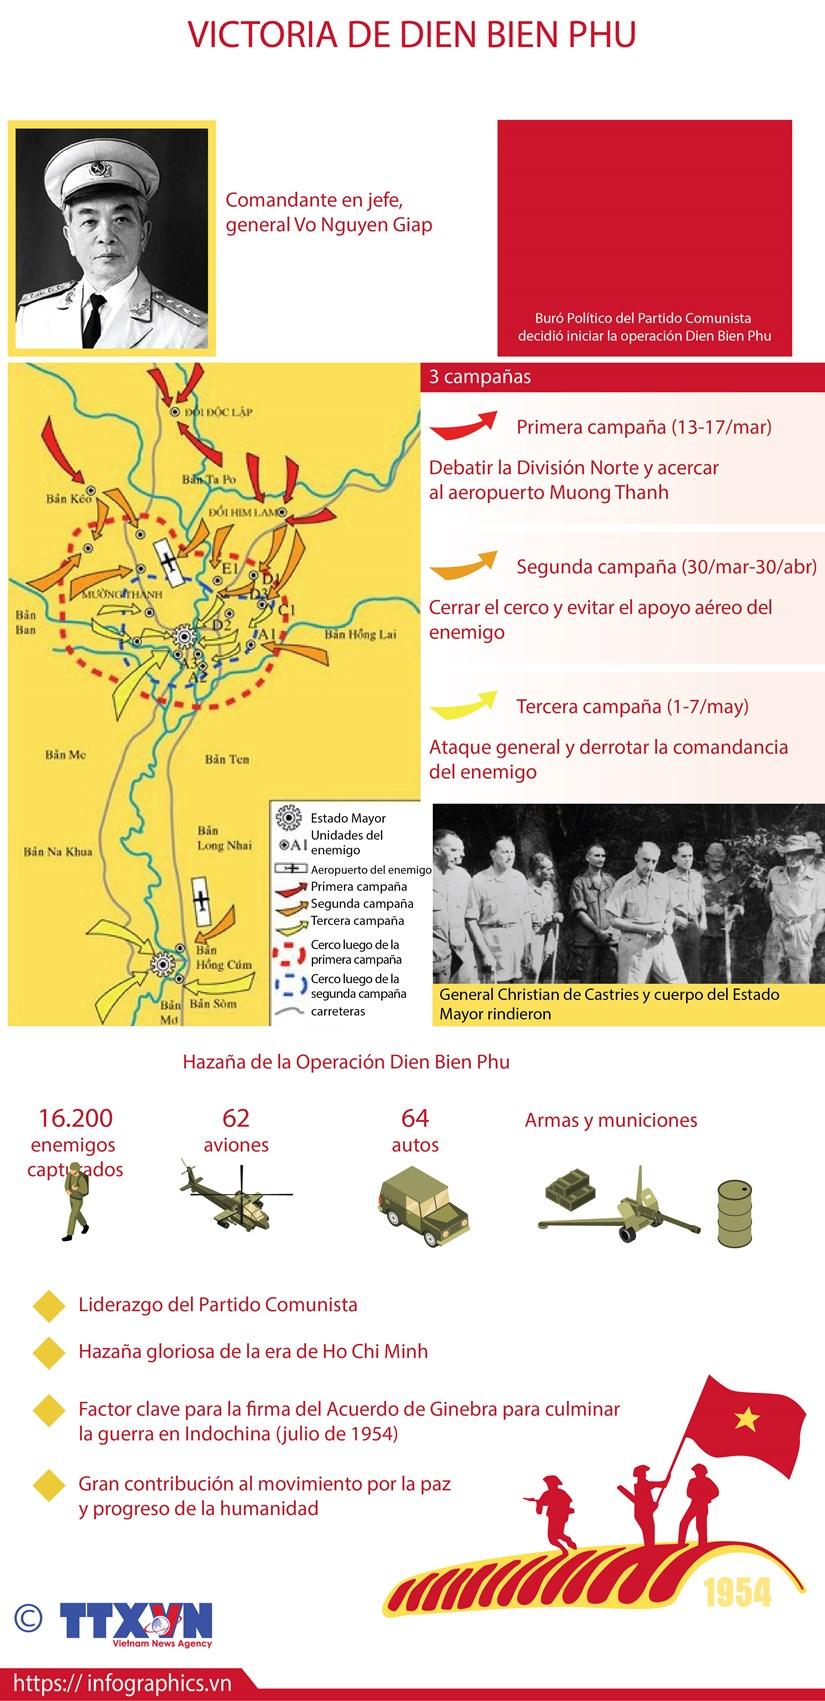 [Info] Victoria de batalla Dien Bien Phu hinh anh 1